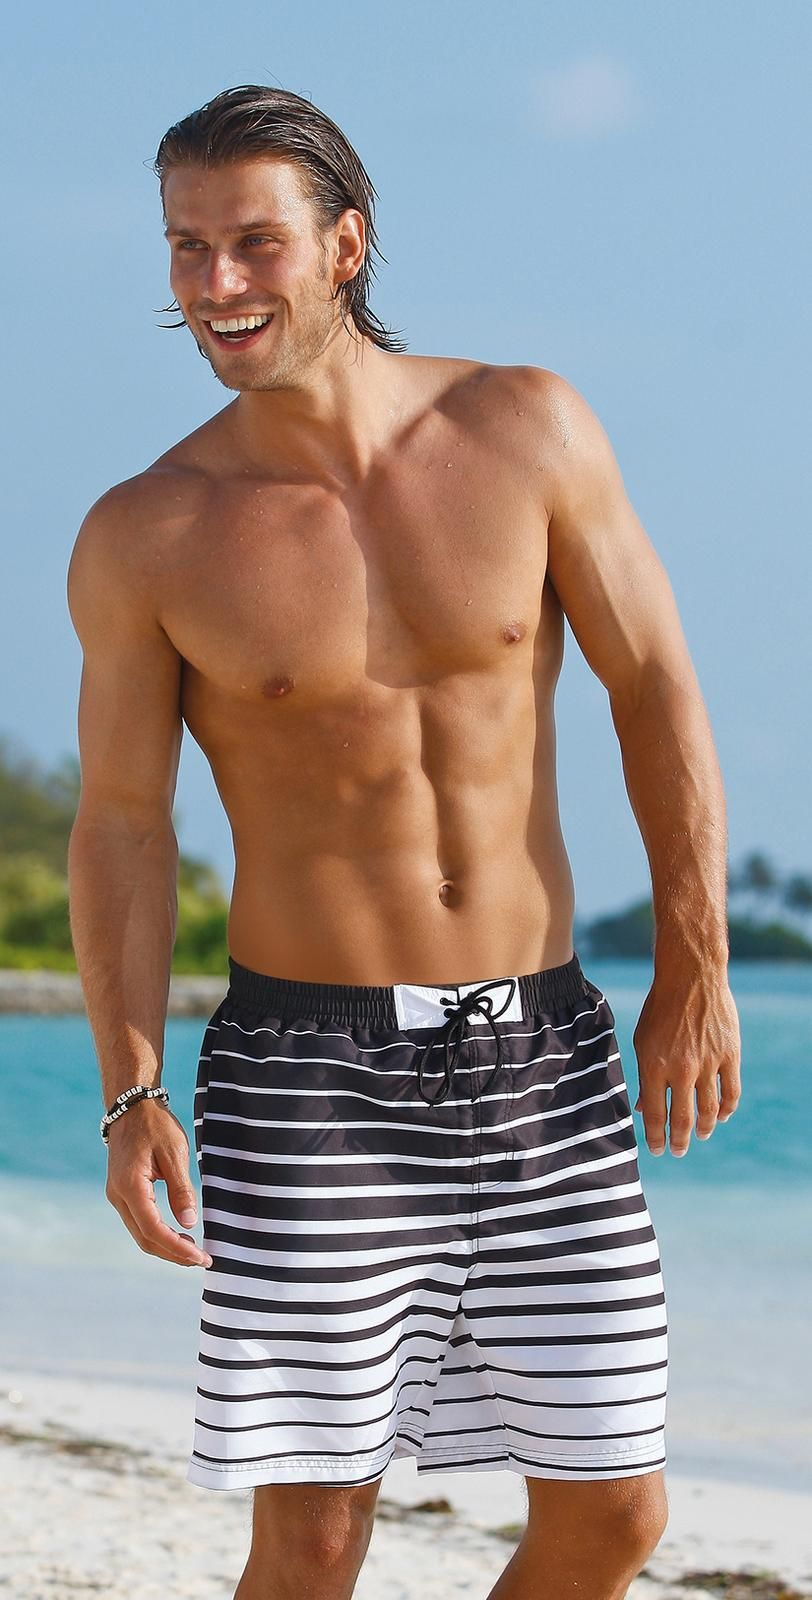 c72ff85a56 #Sunflair 2014 #Sunman Black White Stripe Swim #Trunks 25050-05 # southbeachswimsuits